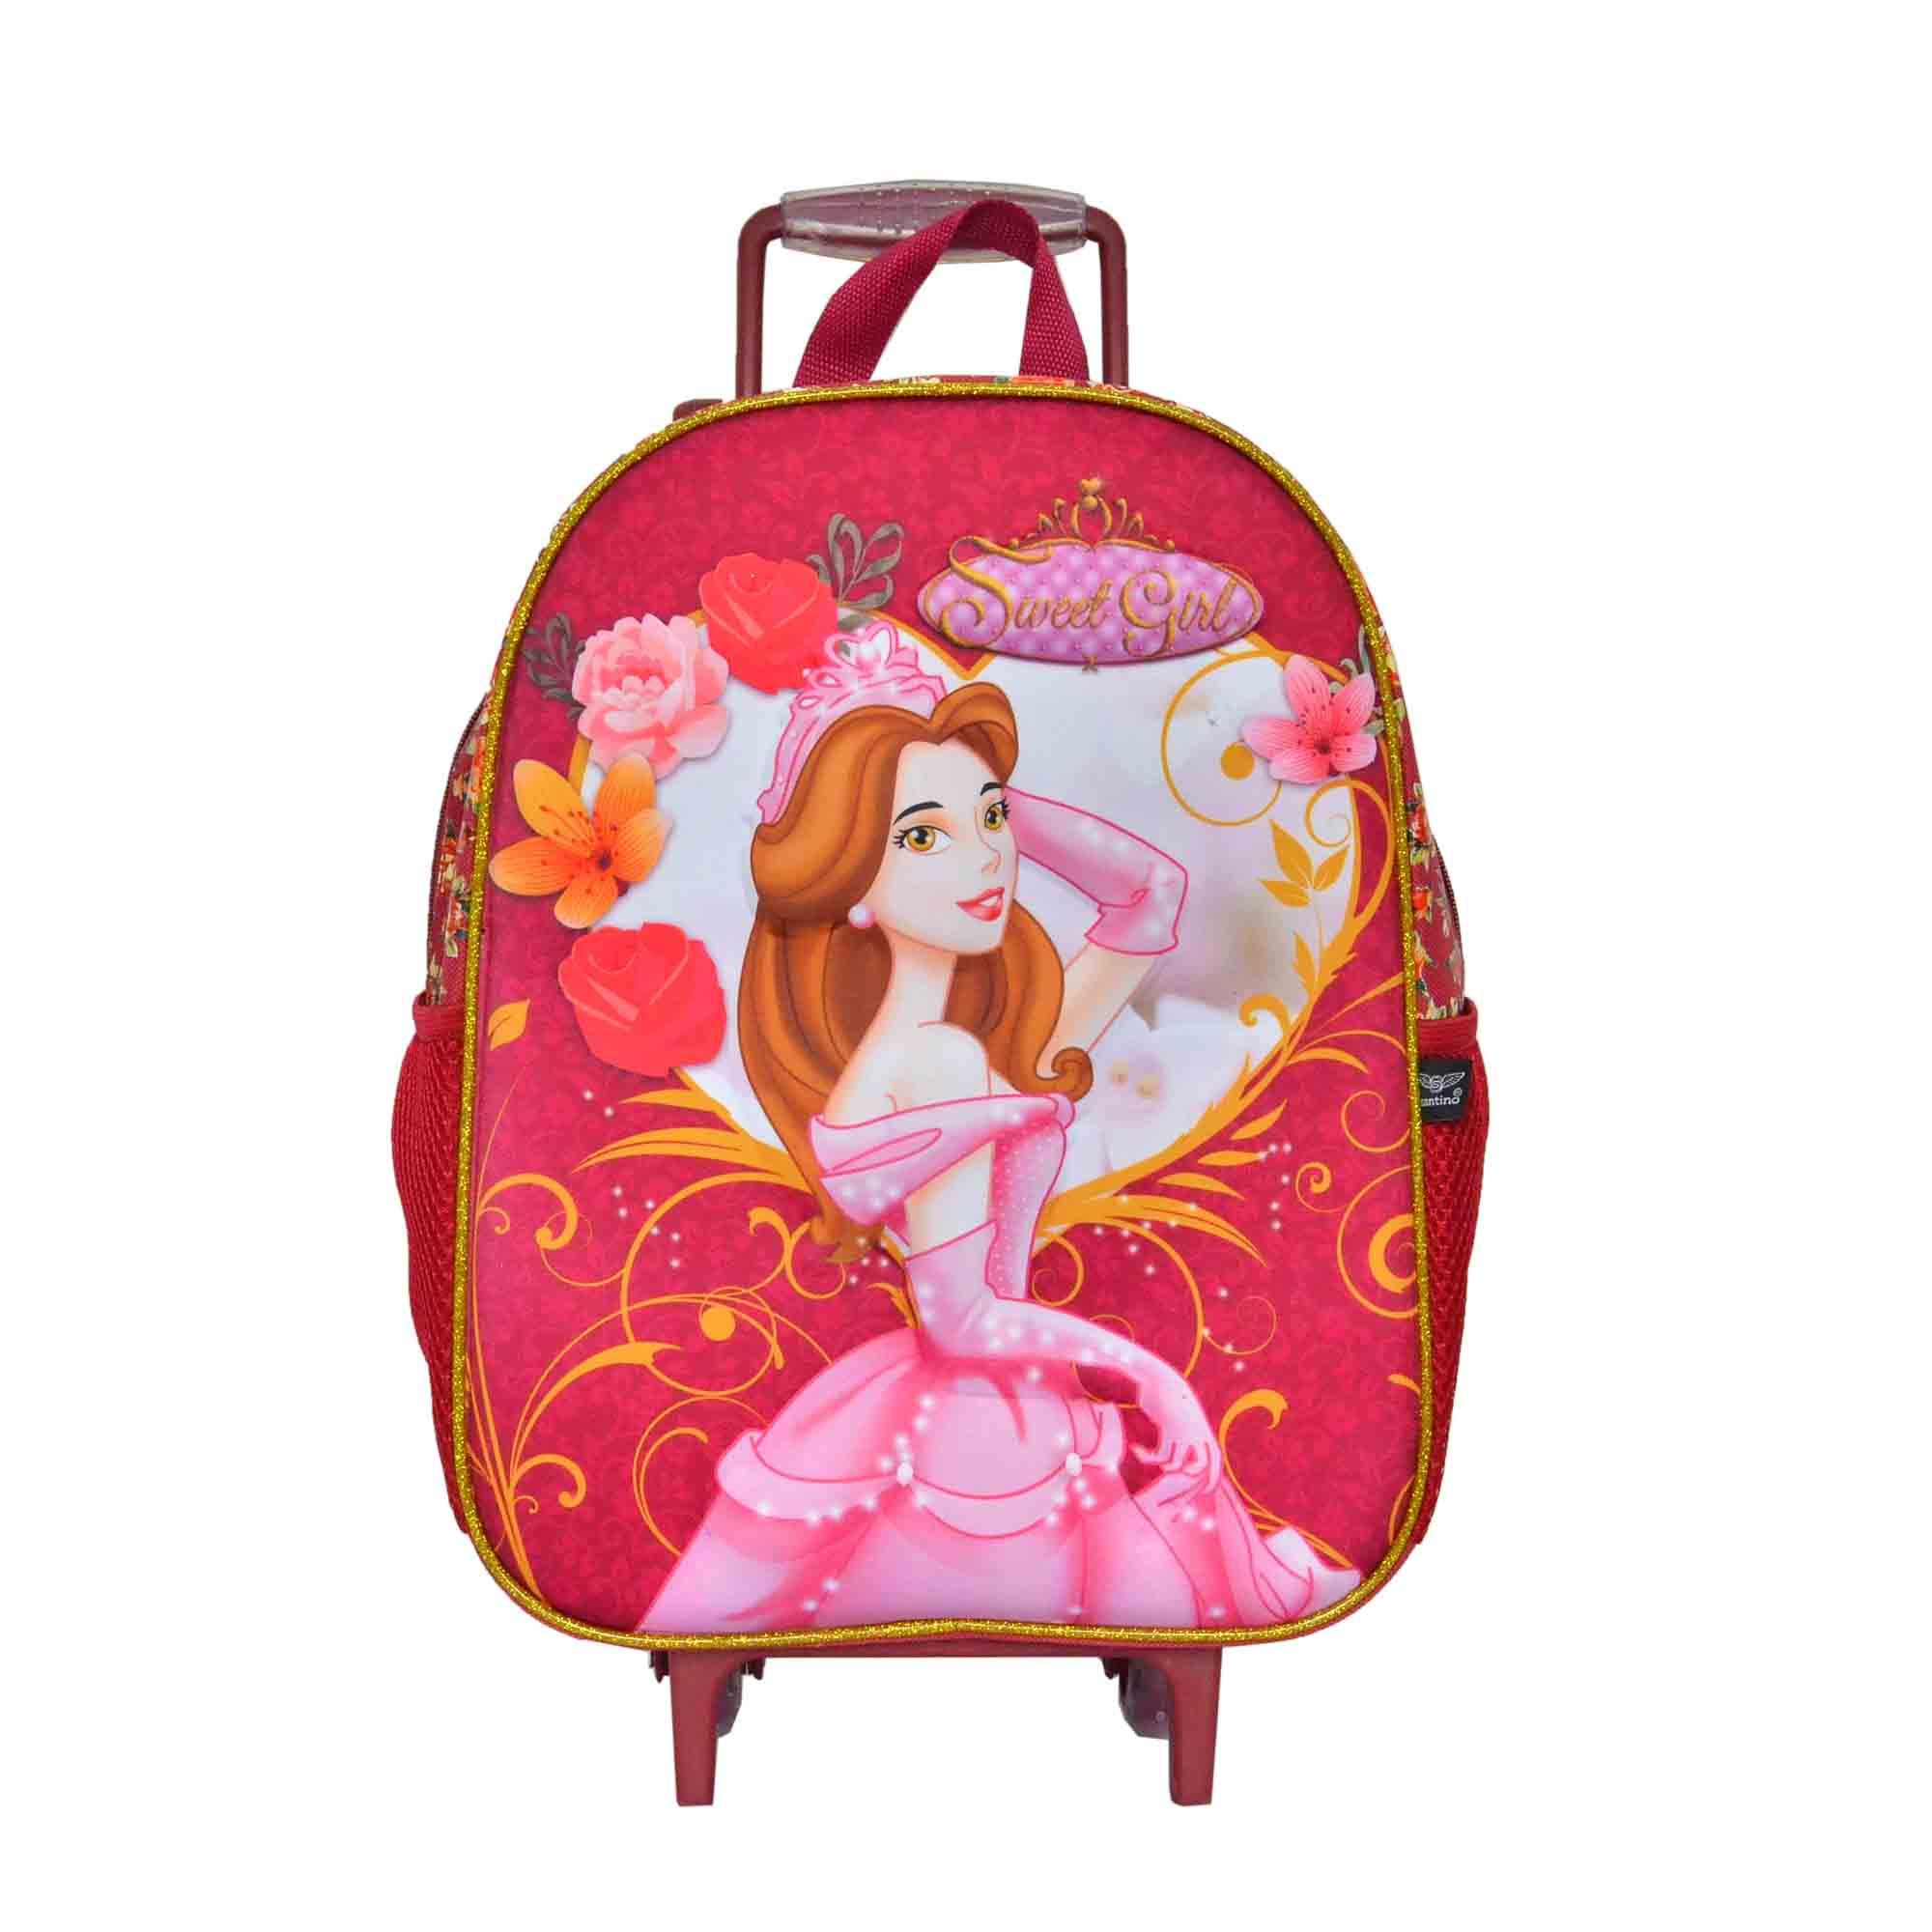 Mochila Infantil Princess Lycia Poliéster Com Rodas Sweet Girl Pink